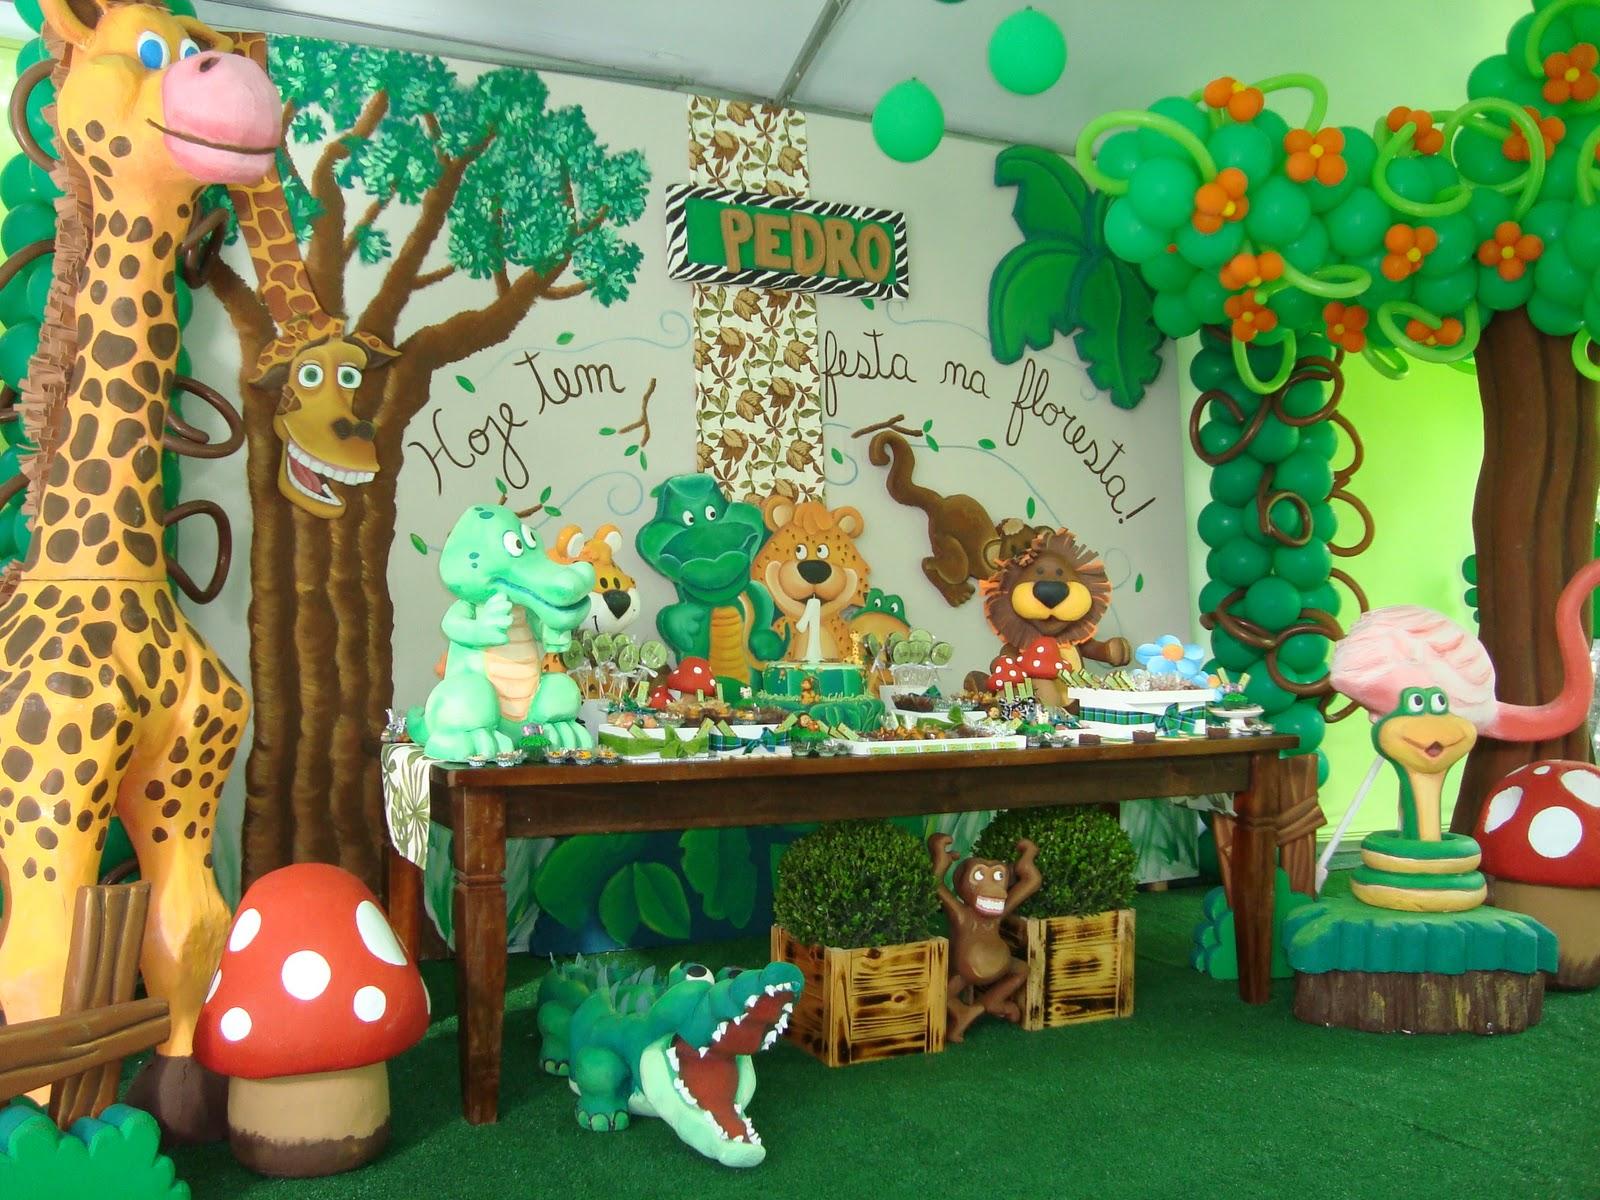 decoracao festa na floresta : decoracao festa na floresta ? Doitri.com